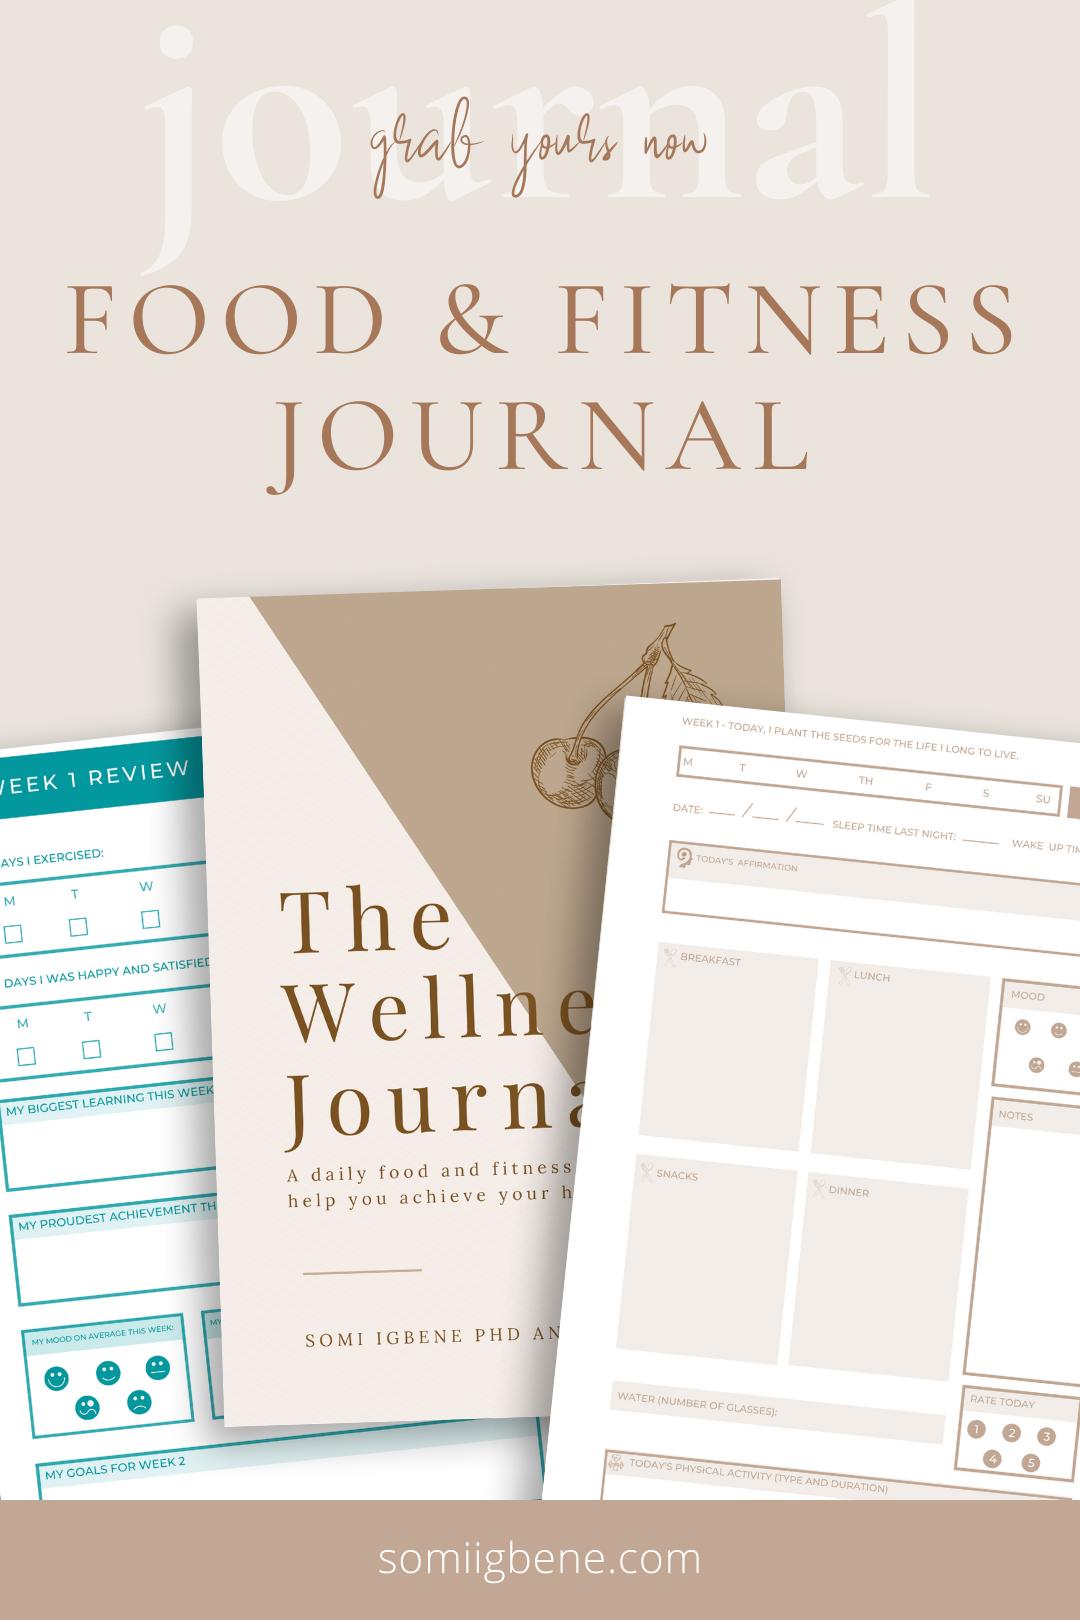 Food & Fitness Journal